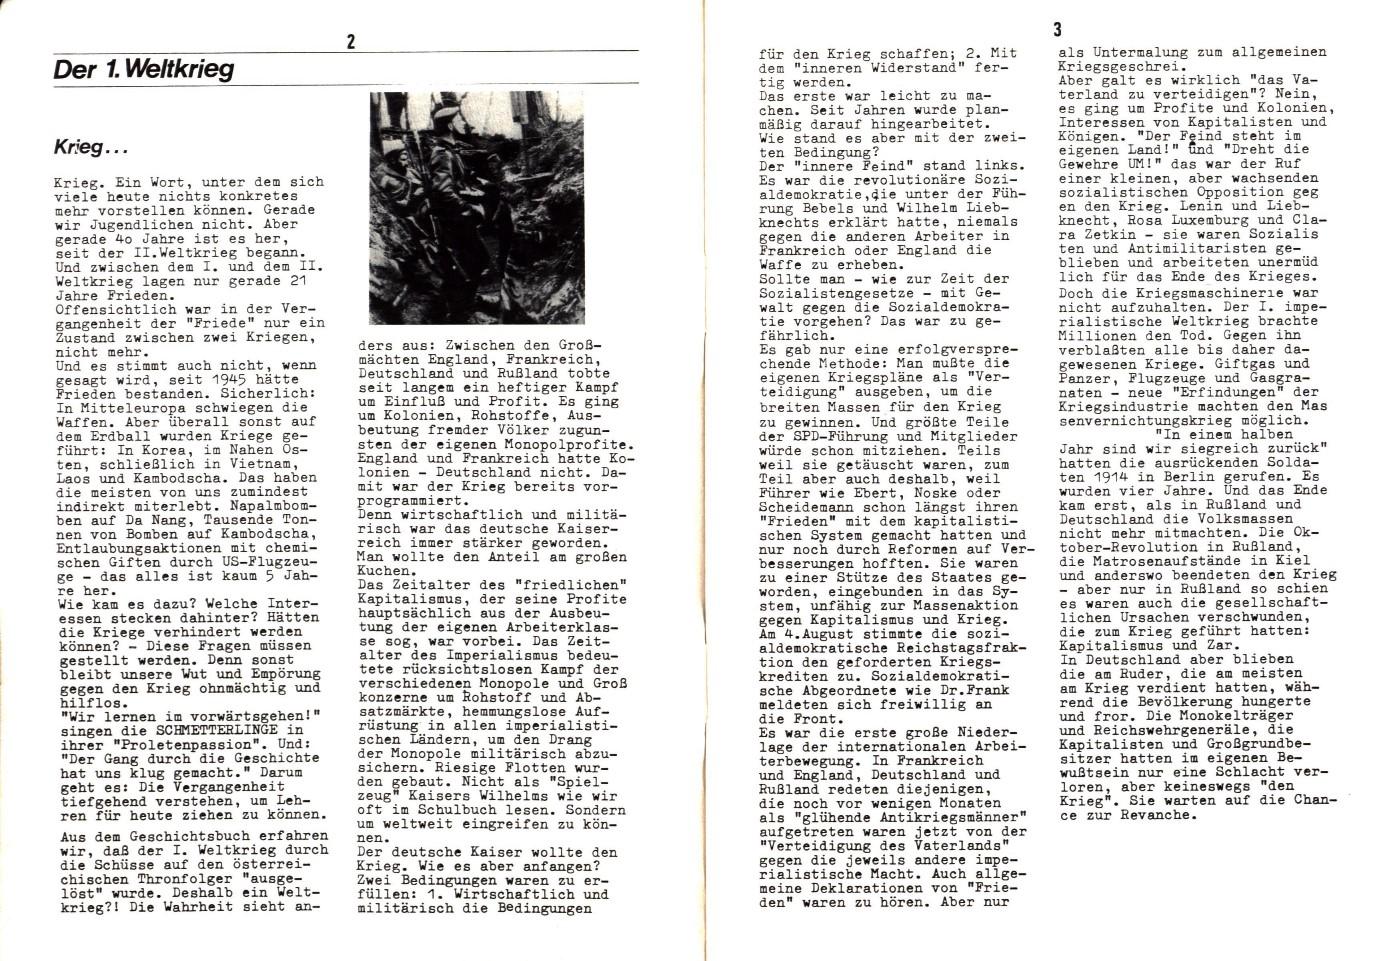 KJVD_1979_Dokumente_zum_Antikriegstag_03